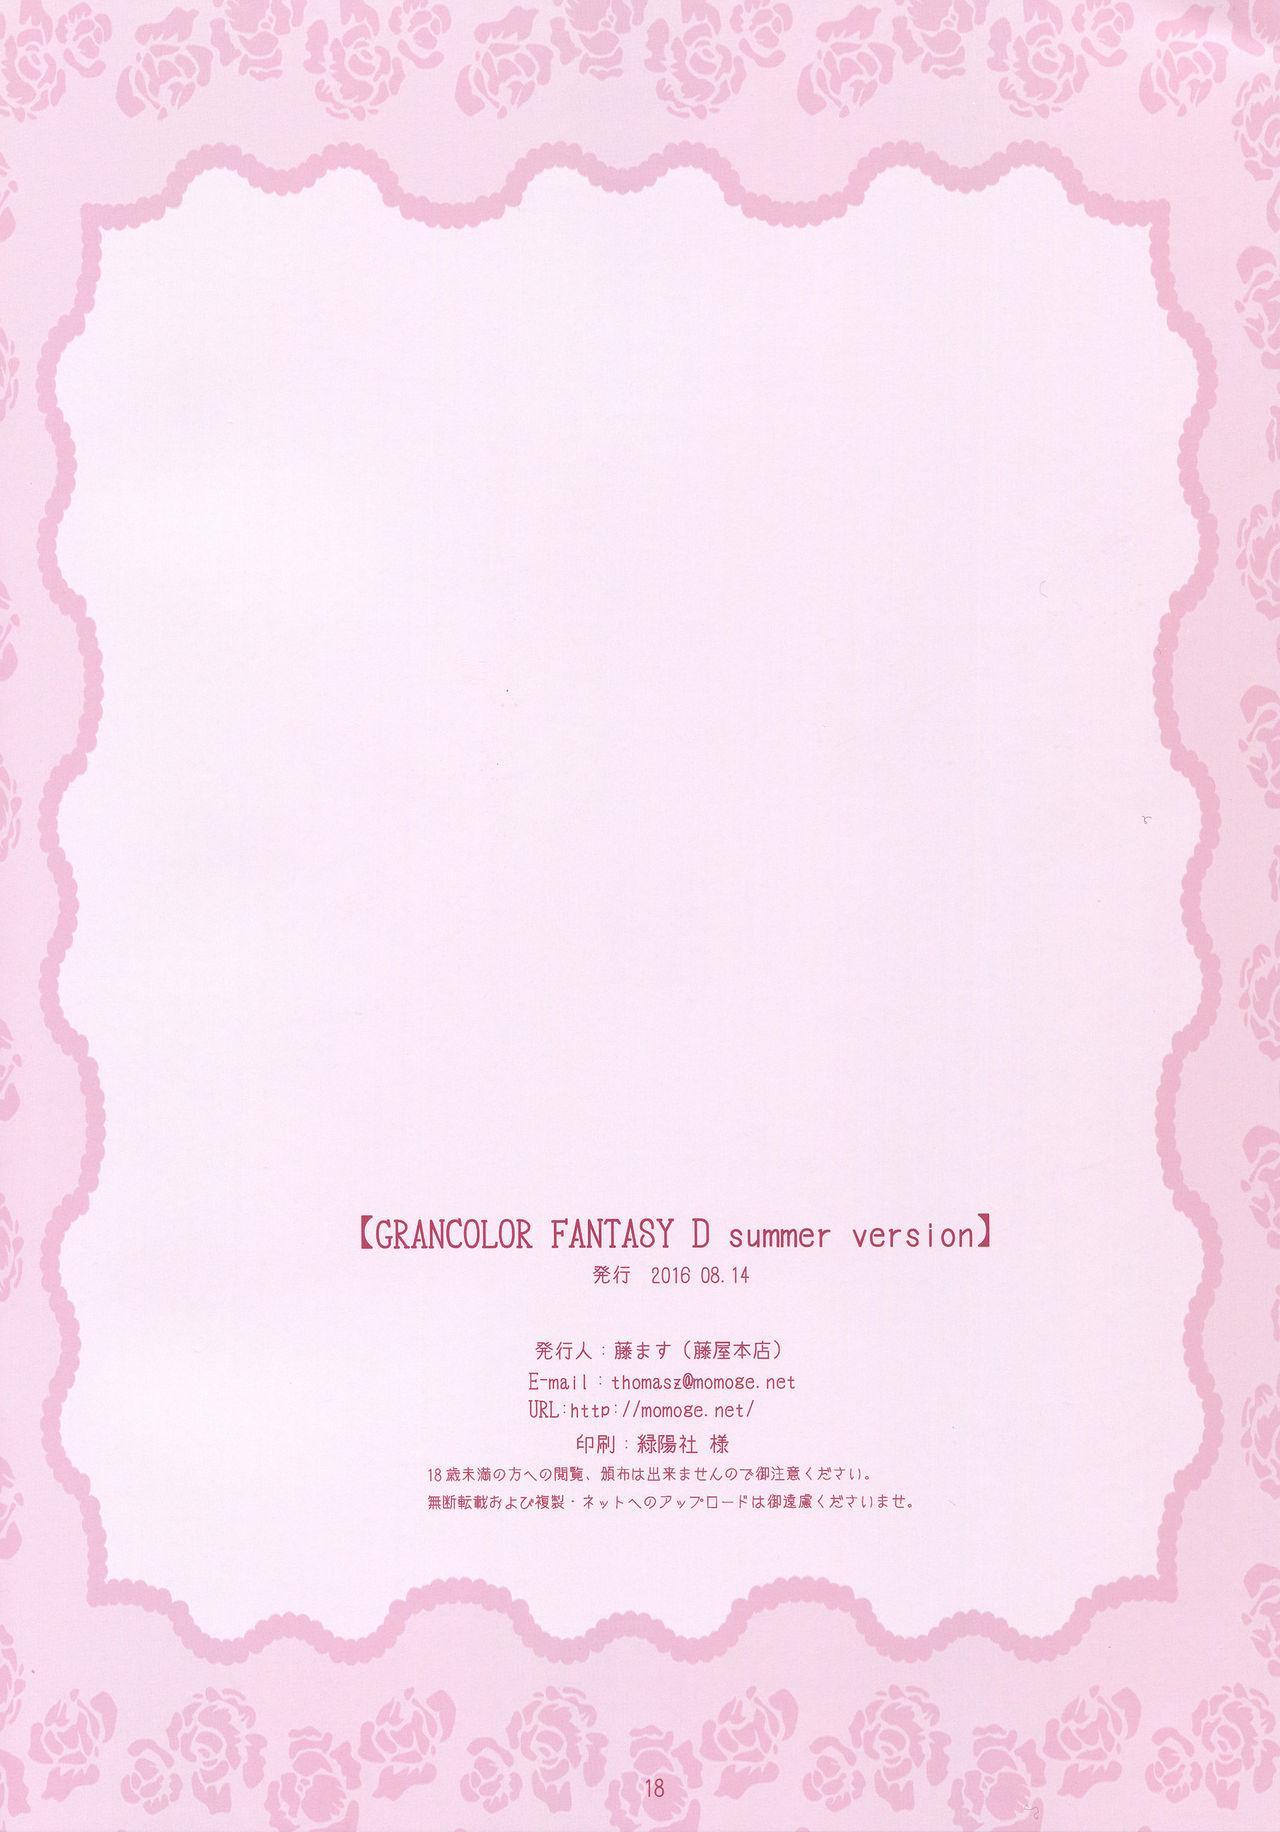 GRANCOLOR FANTASY D summer version 20